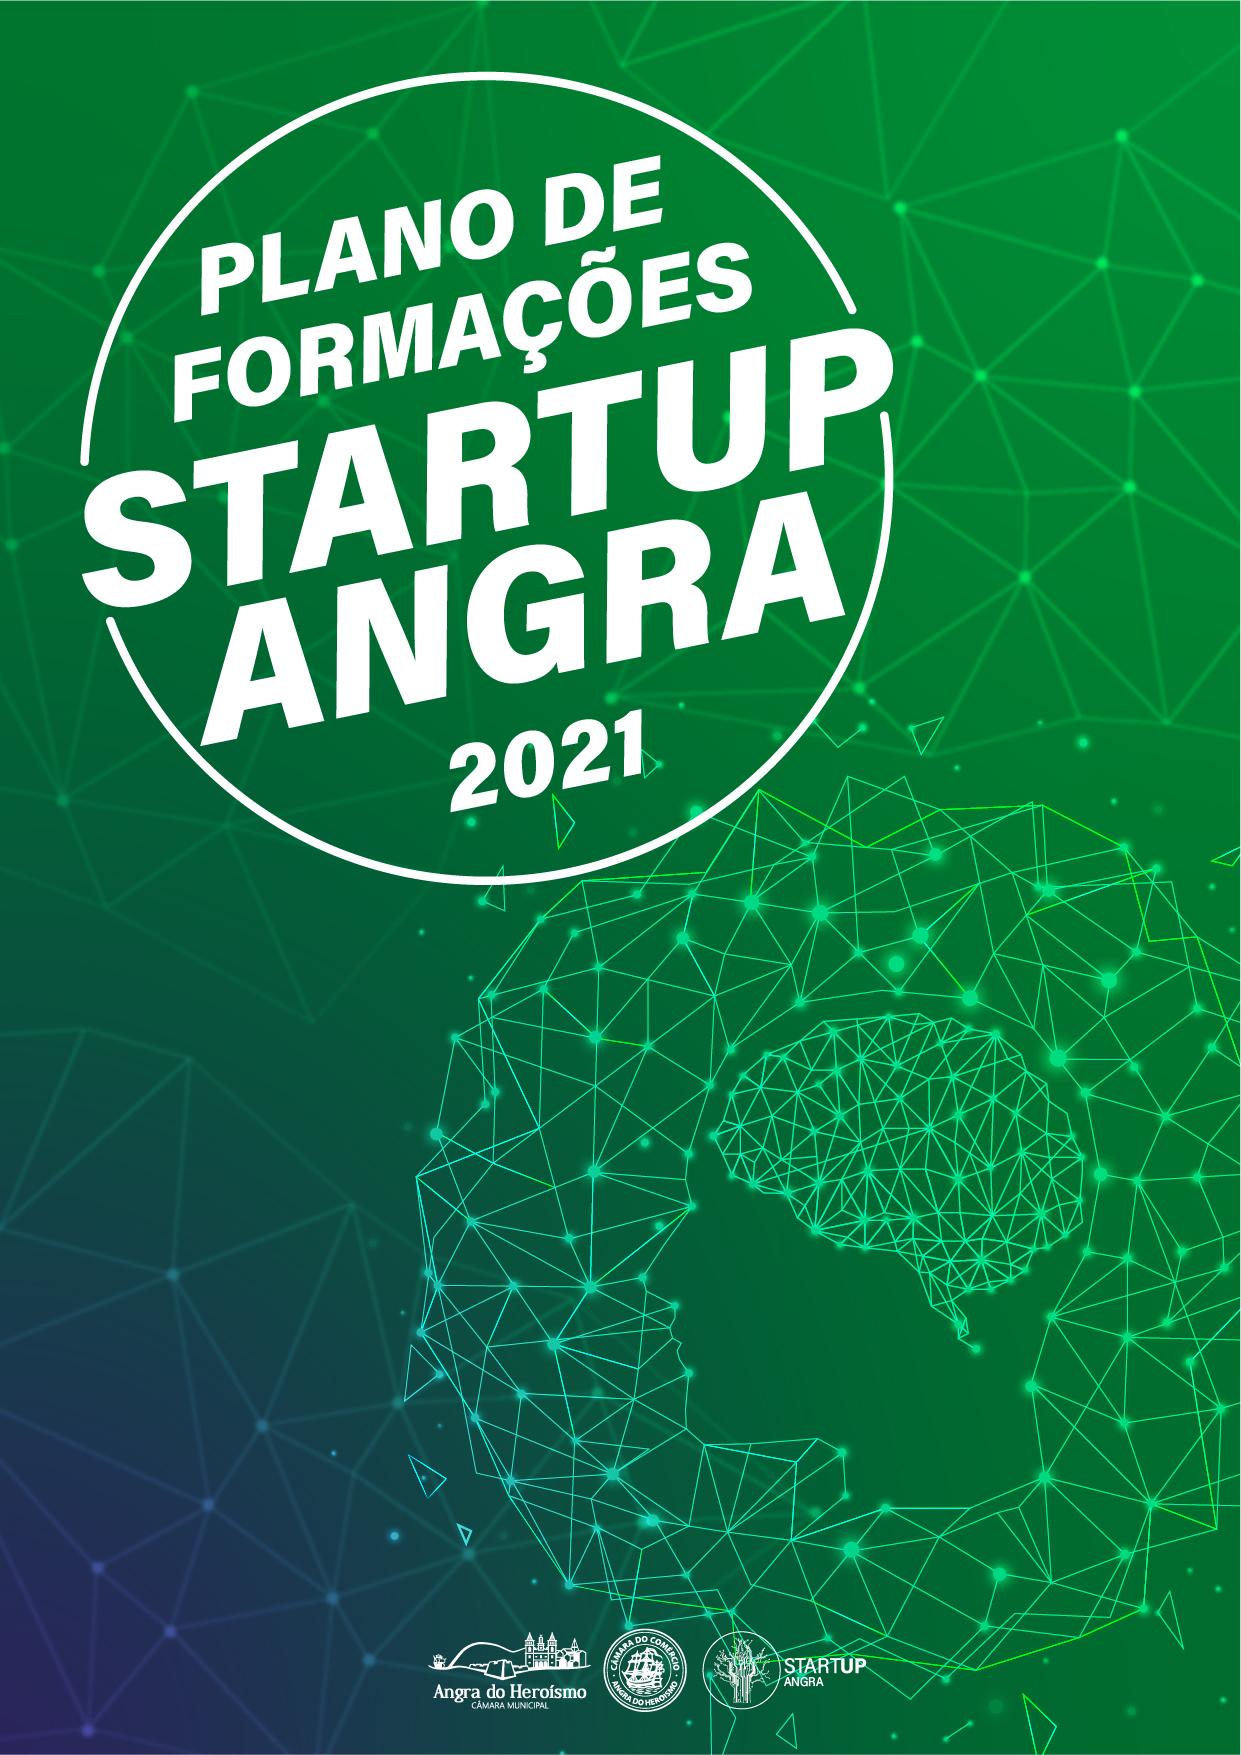 https://www.startupangra.com/wp-content/uploads/2021/03/grafismo_poster-geral.jpg